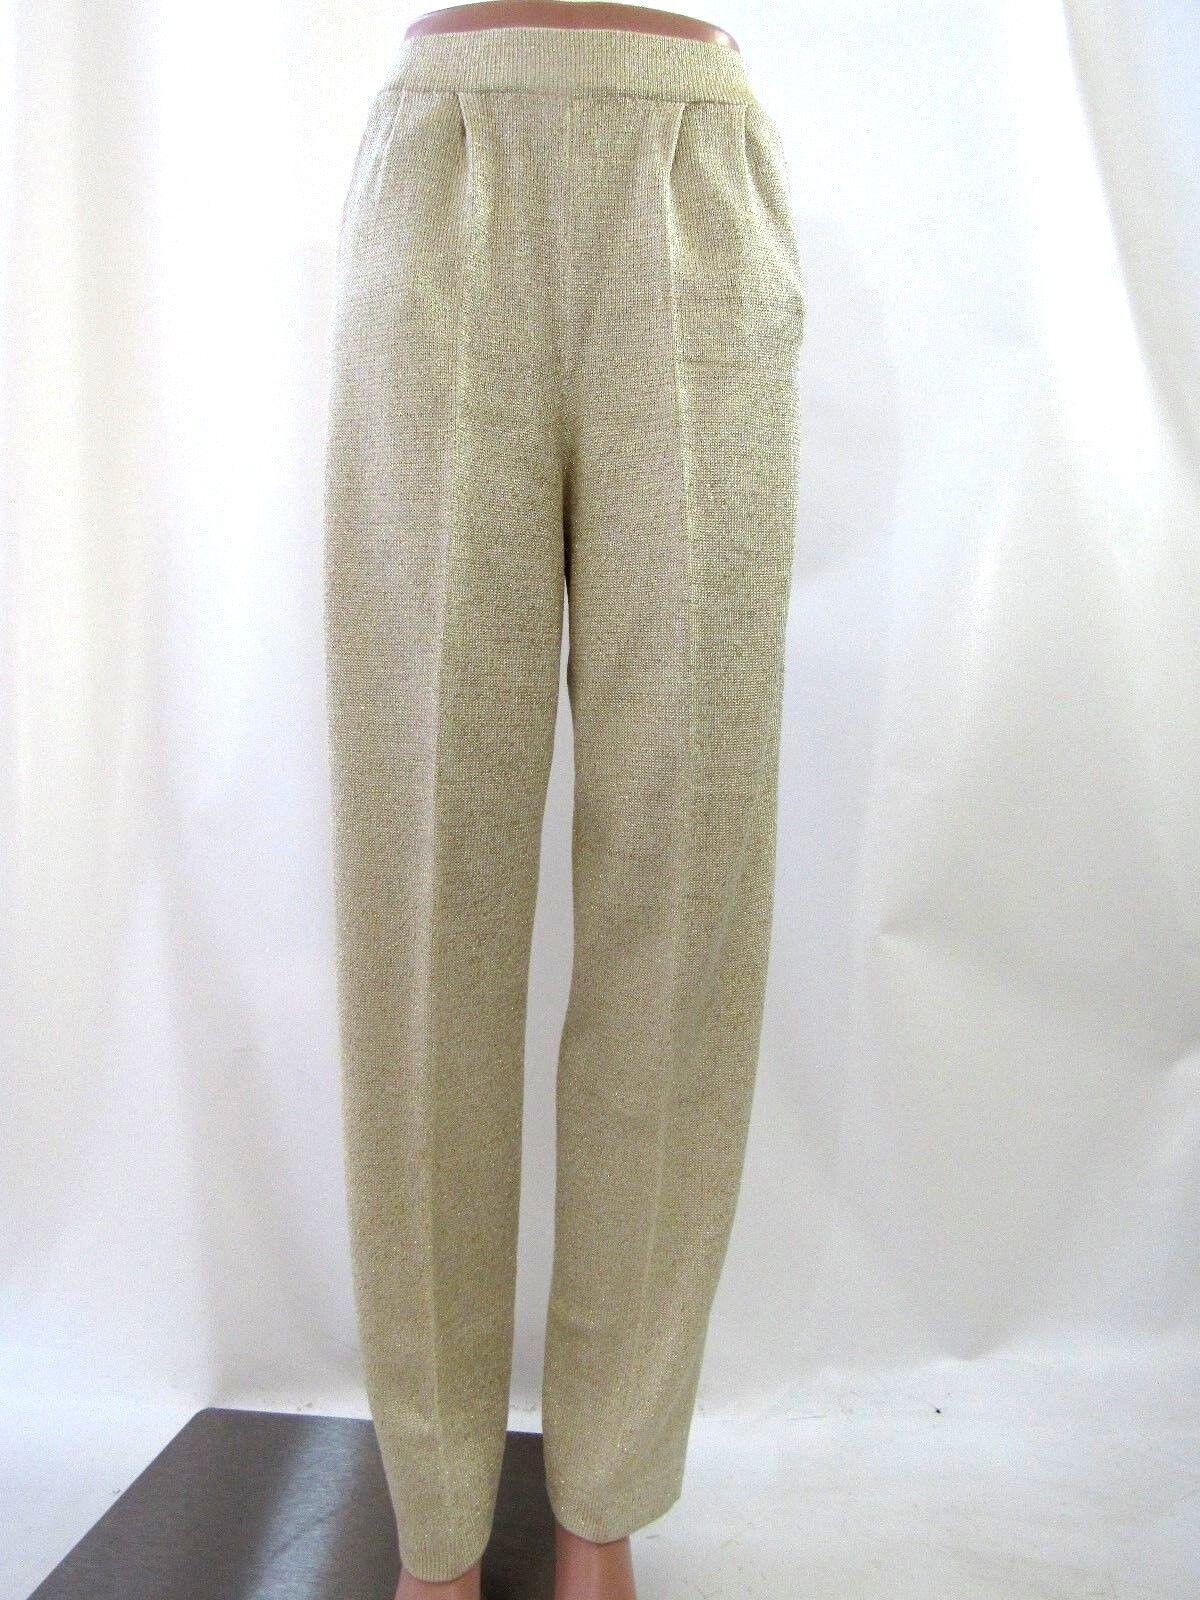 Emporio Armani Gold Santana Knit Pants Größe 6